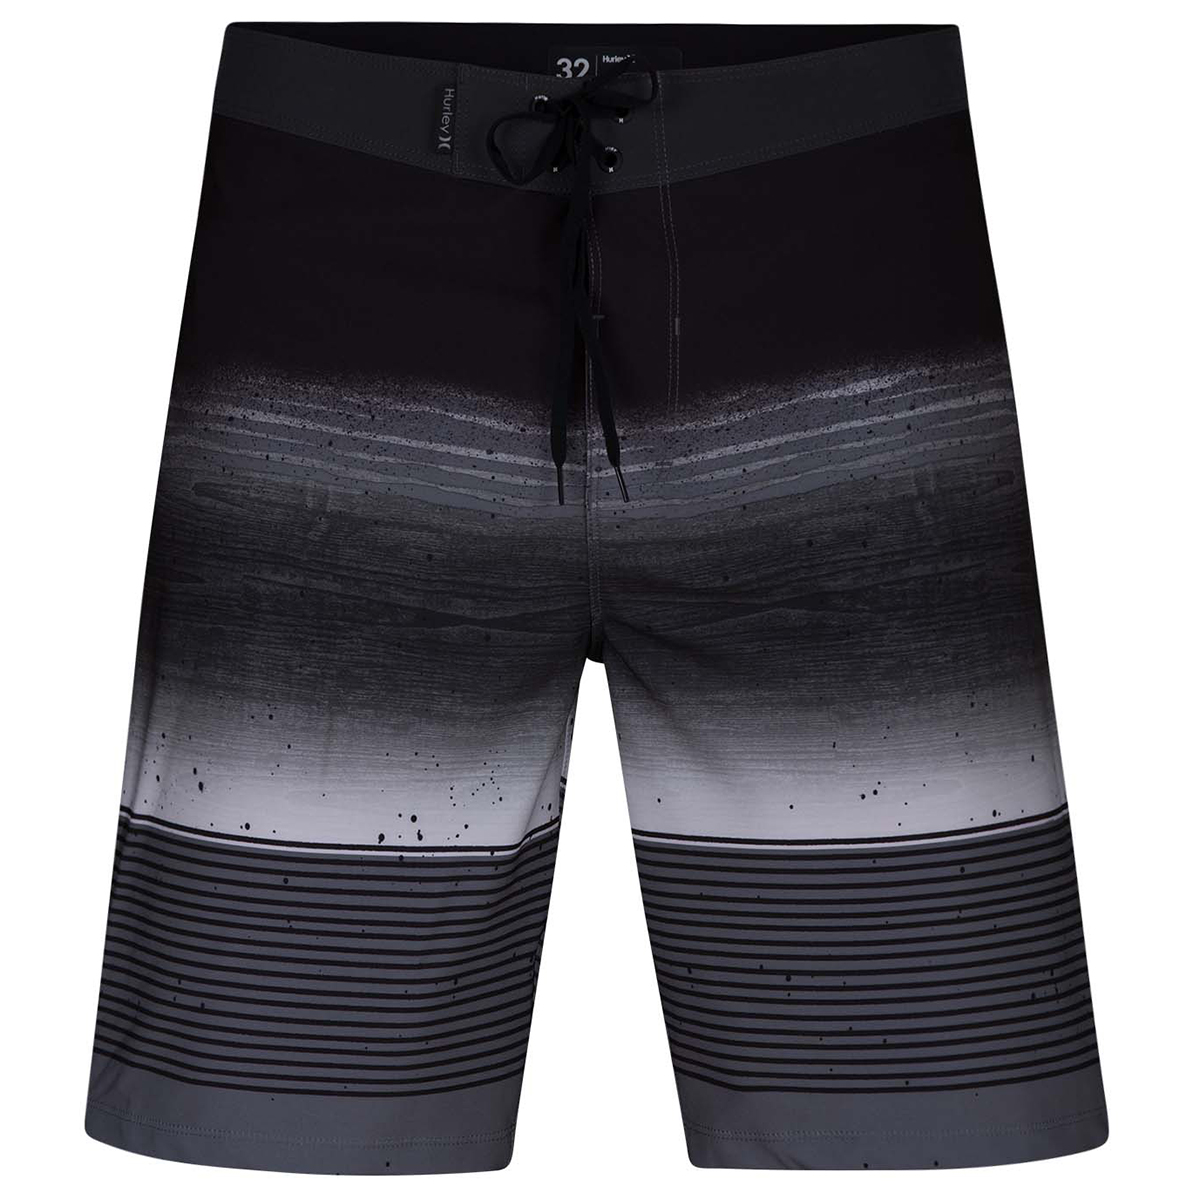 "Hurley Young Men's Phantom Overspray 20"" Board Shorts - Black, 32"